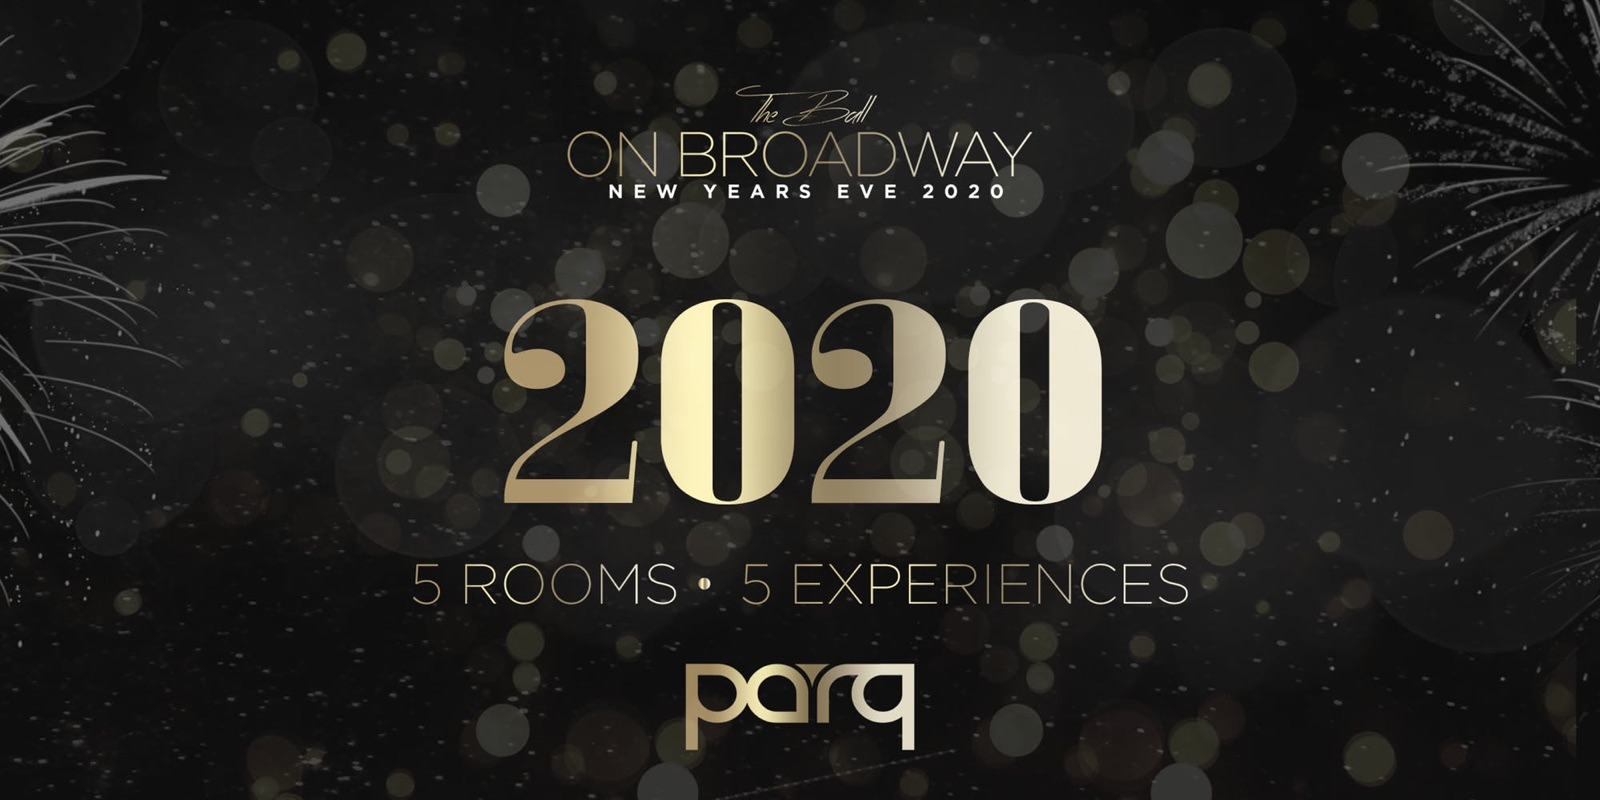 Ball on Broadway: NYE 2020 At Parq